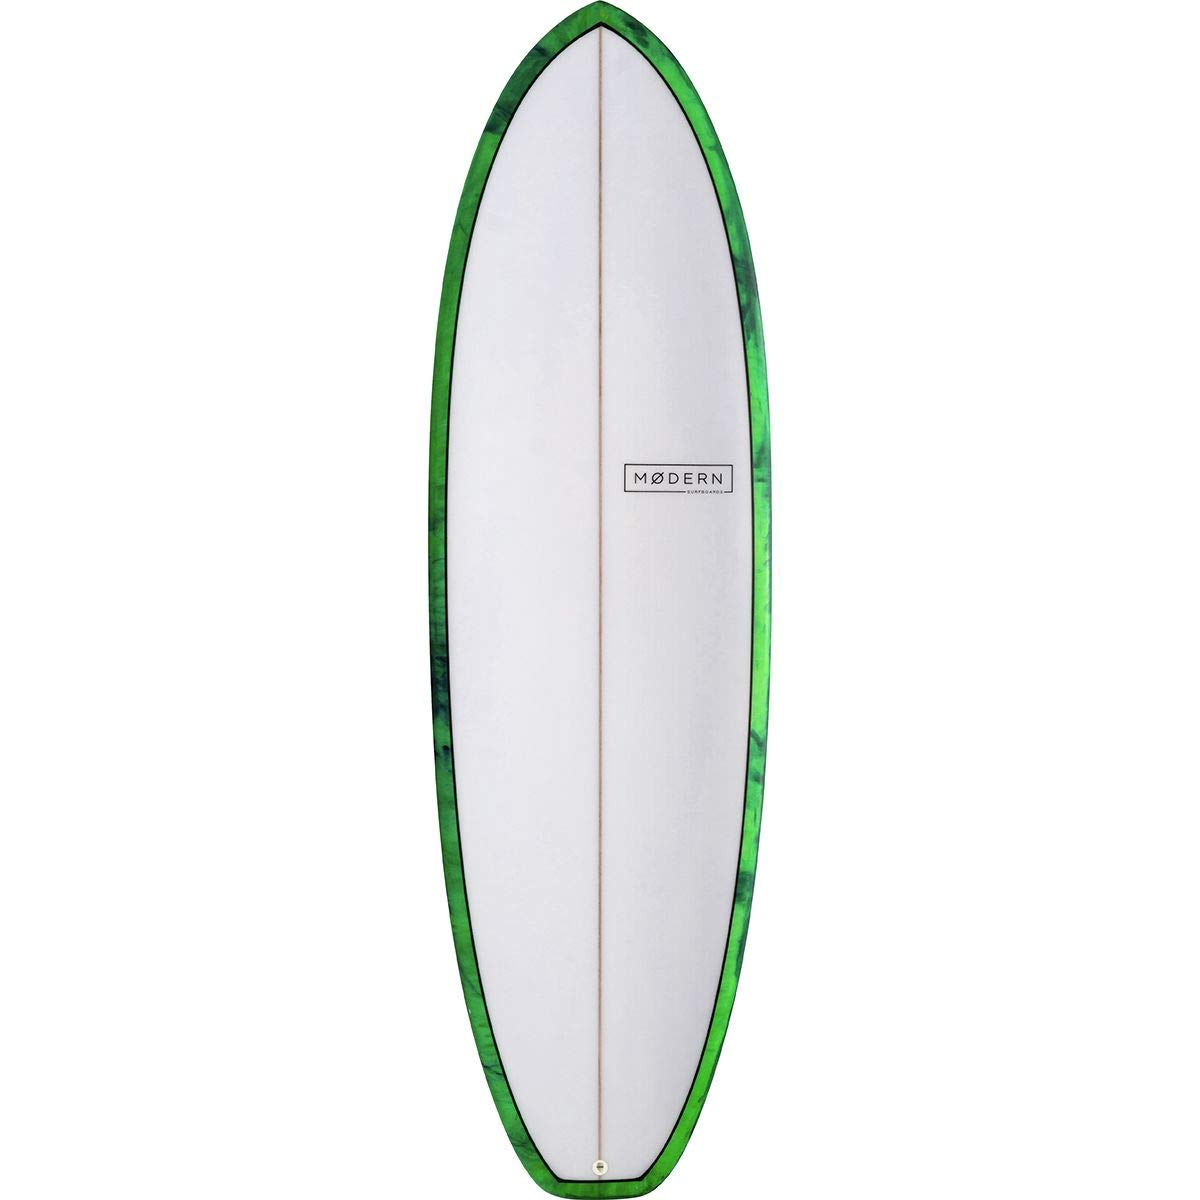 Modern Surfboards Highline PU Surfboard Sea Tint, 6ft 4in by Modern Surfboards